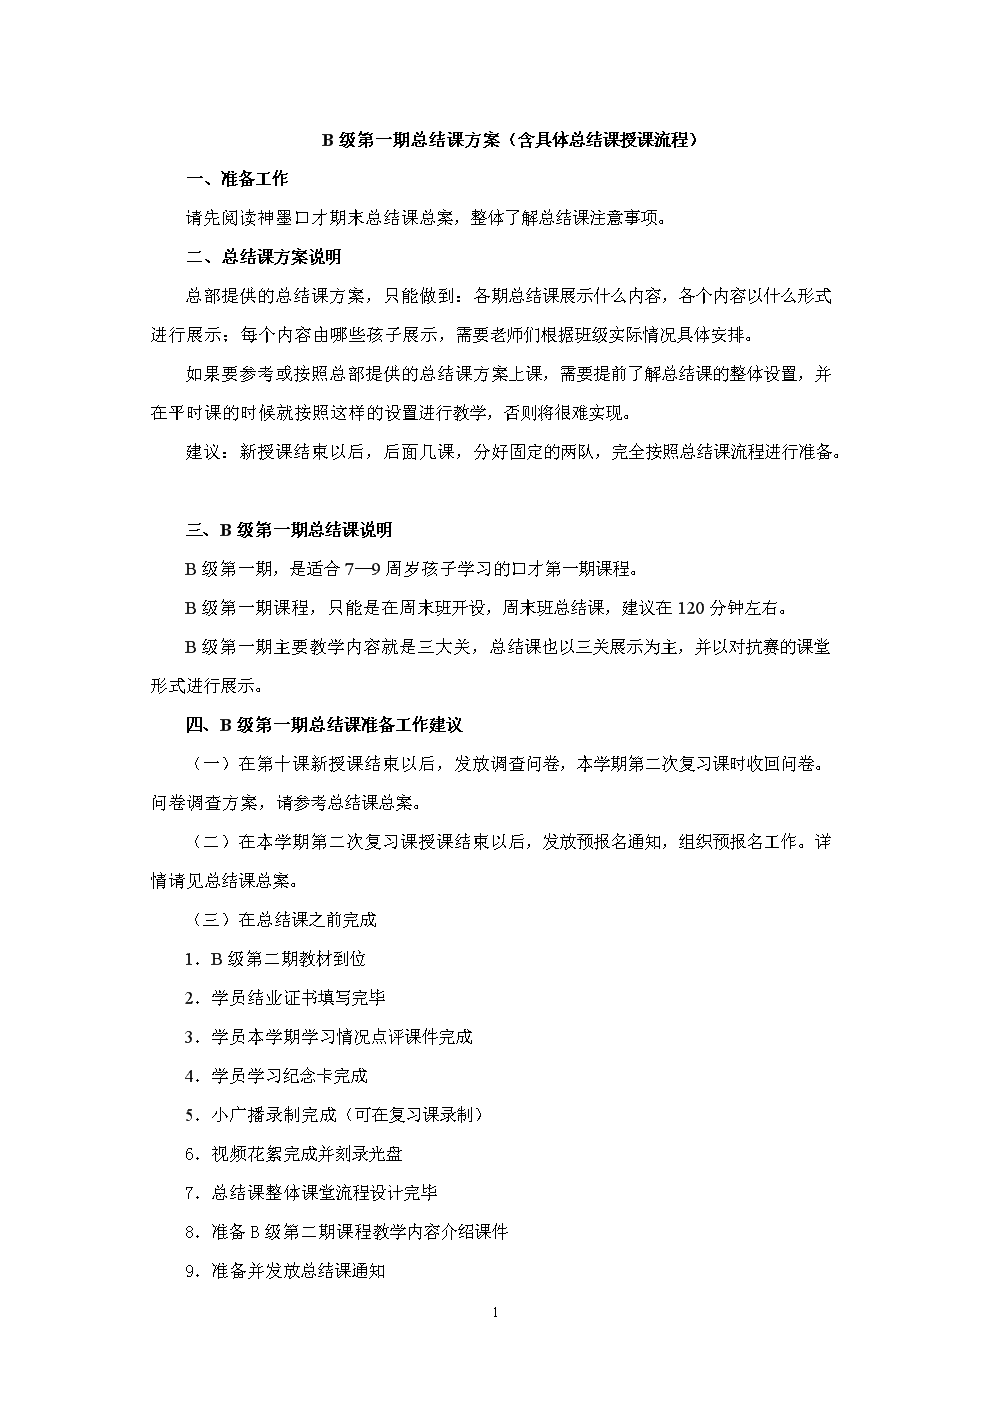 B级第一期总结课方案 V1.0.doc